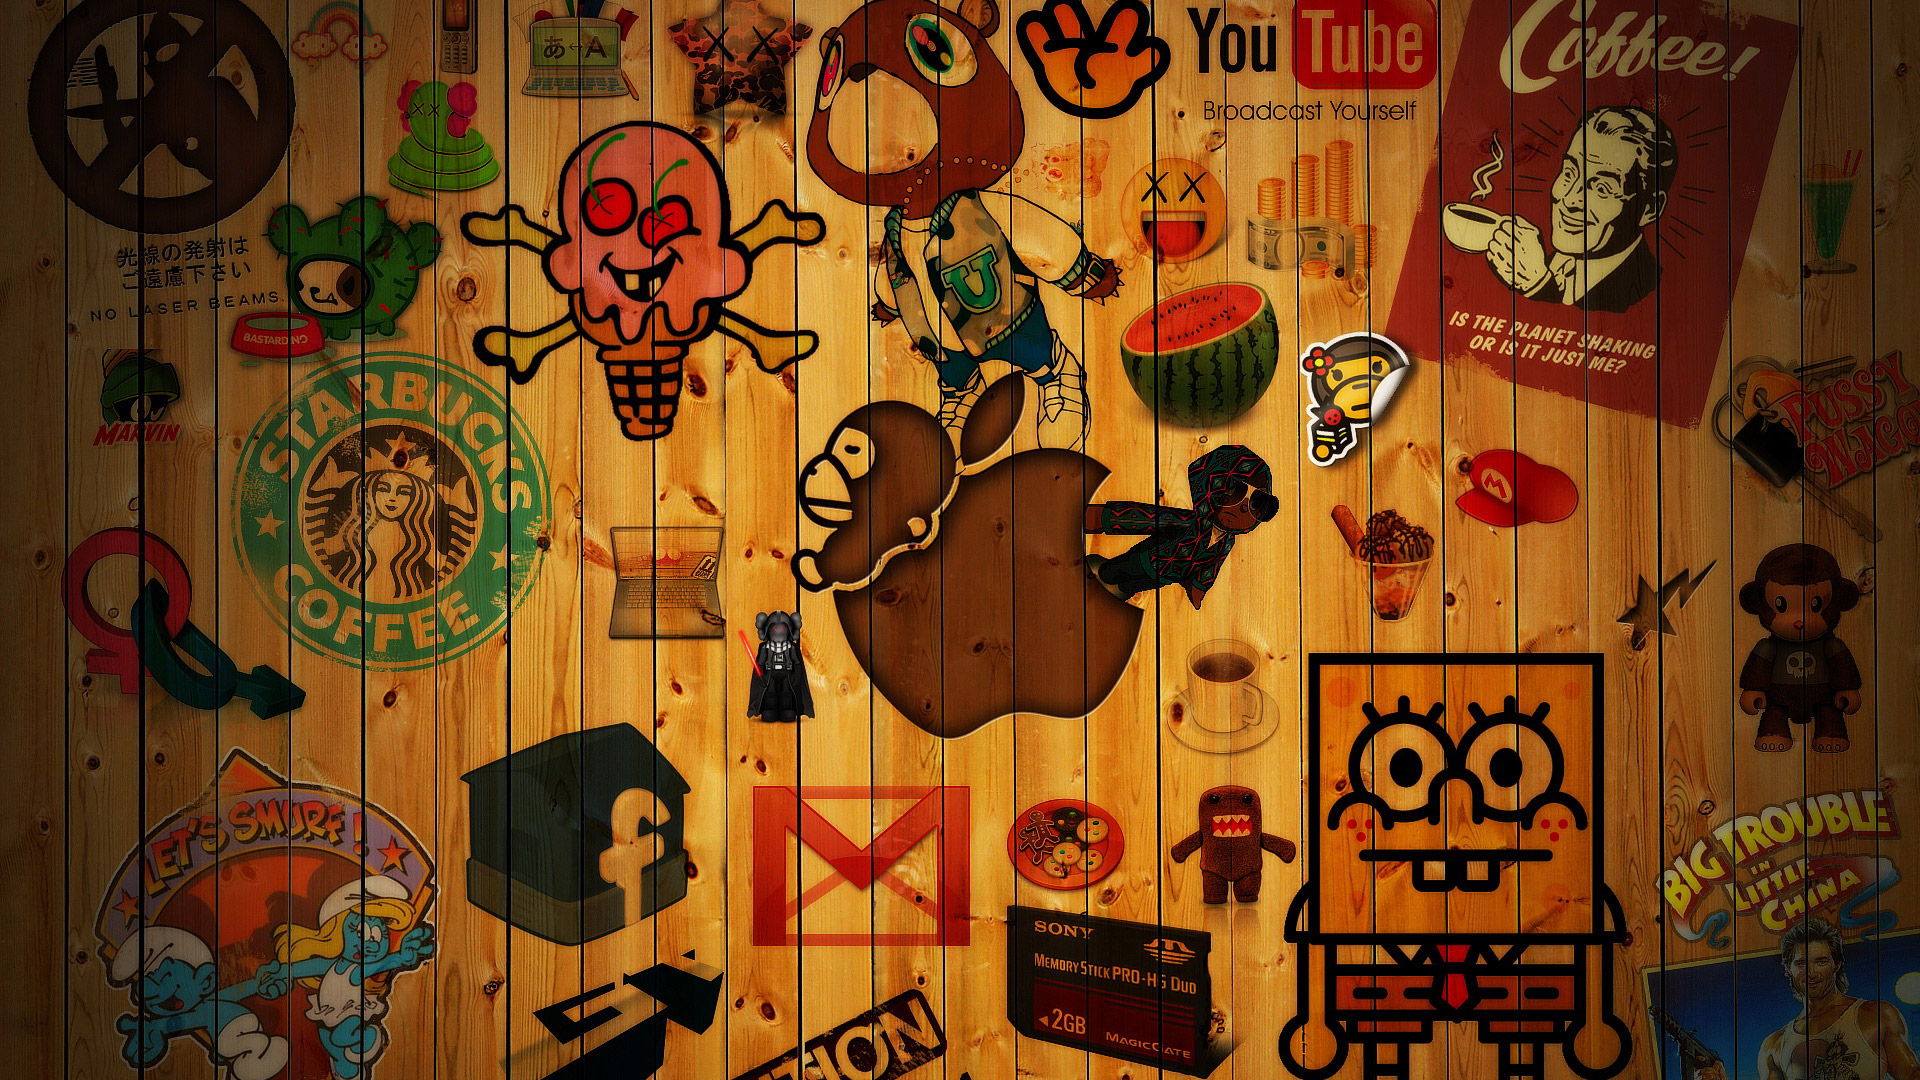 Hd wallpaper wood - Wood Wallpaper Background 26